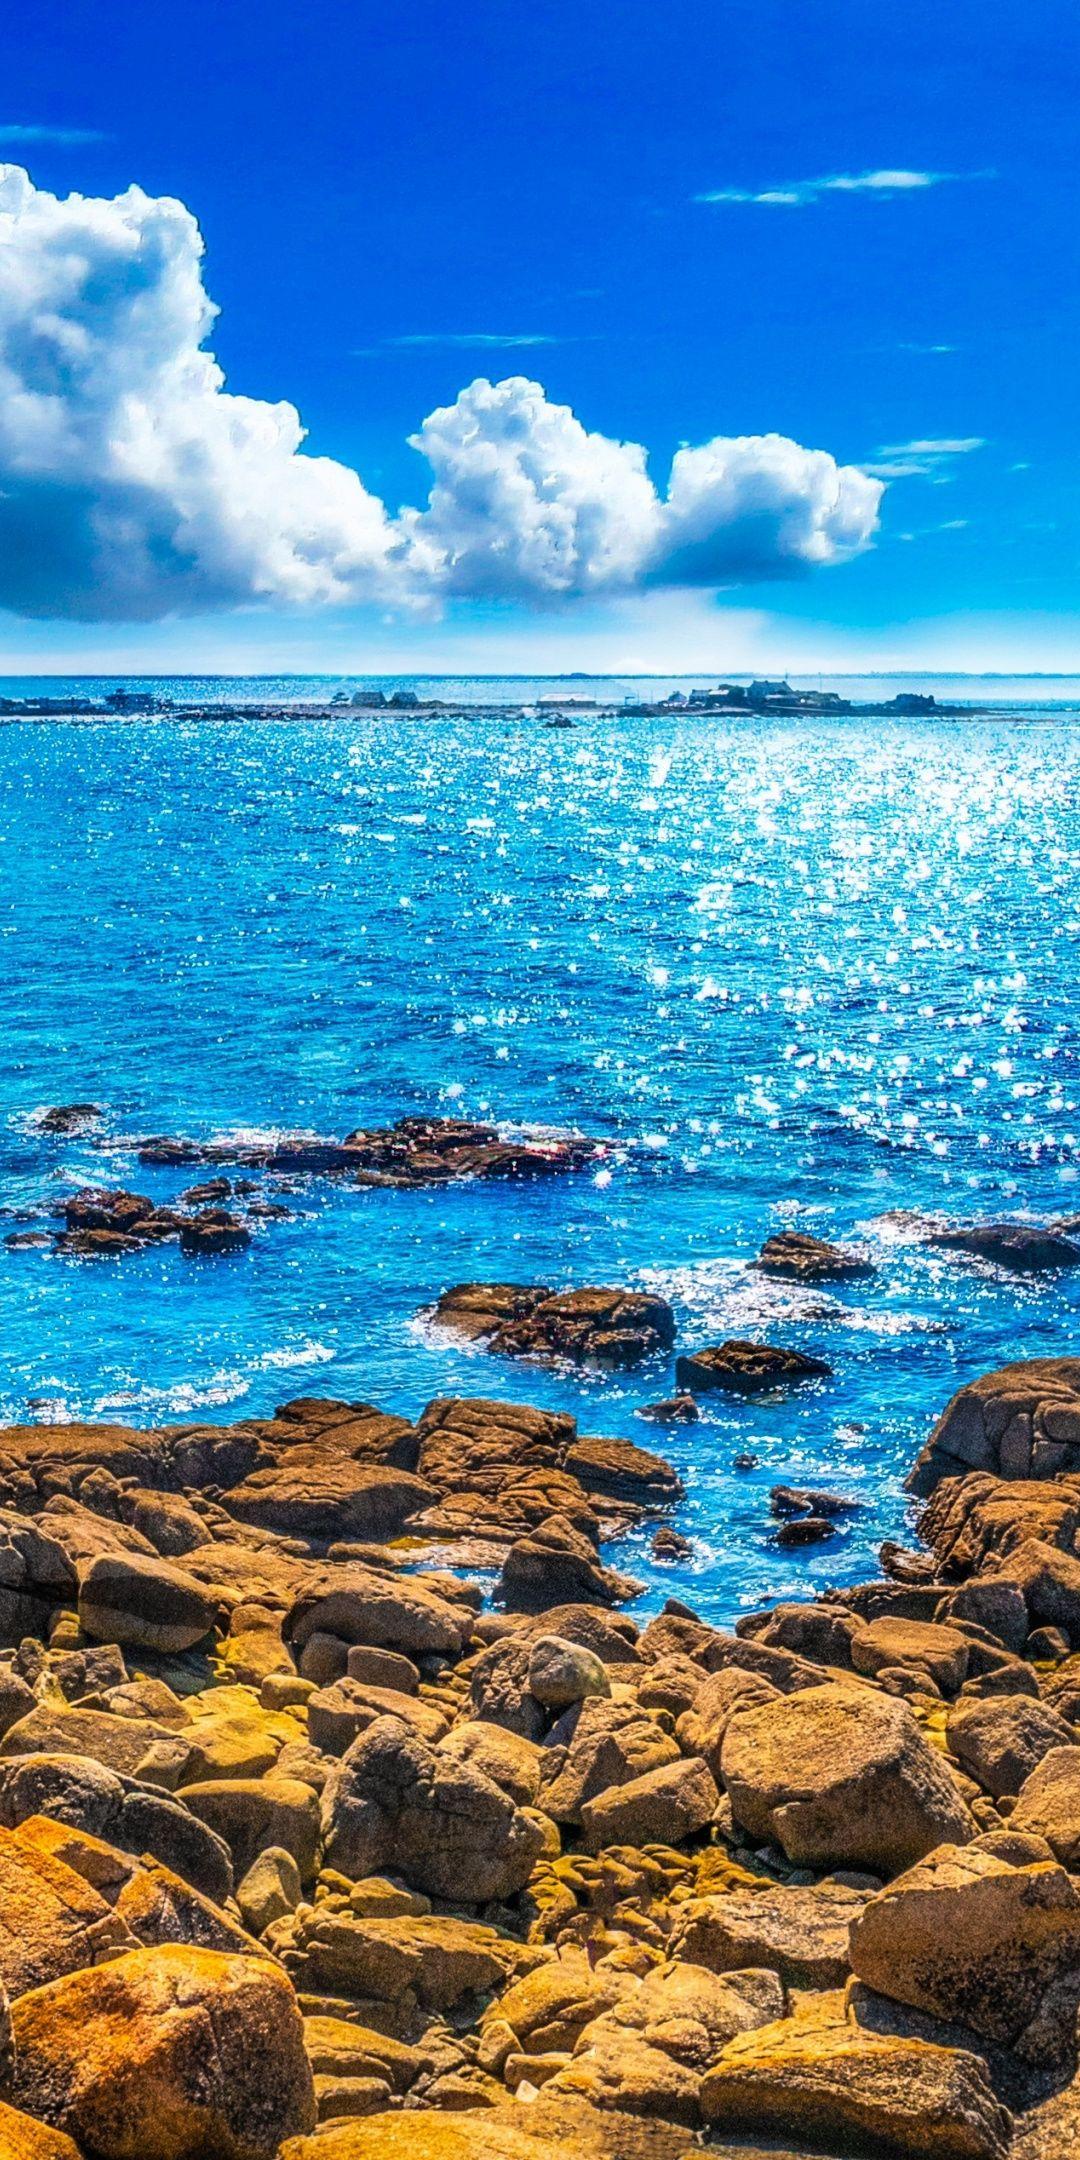 Rocks Coast Sunny Day Blue Sea 1080x2160 Wallpaper Beautiful Nature Wallpaper Beautiful Wallpaper For Phone Nature Wallpaper